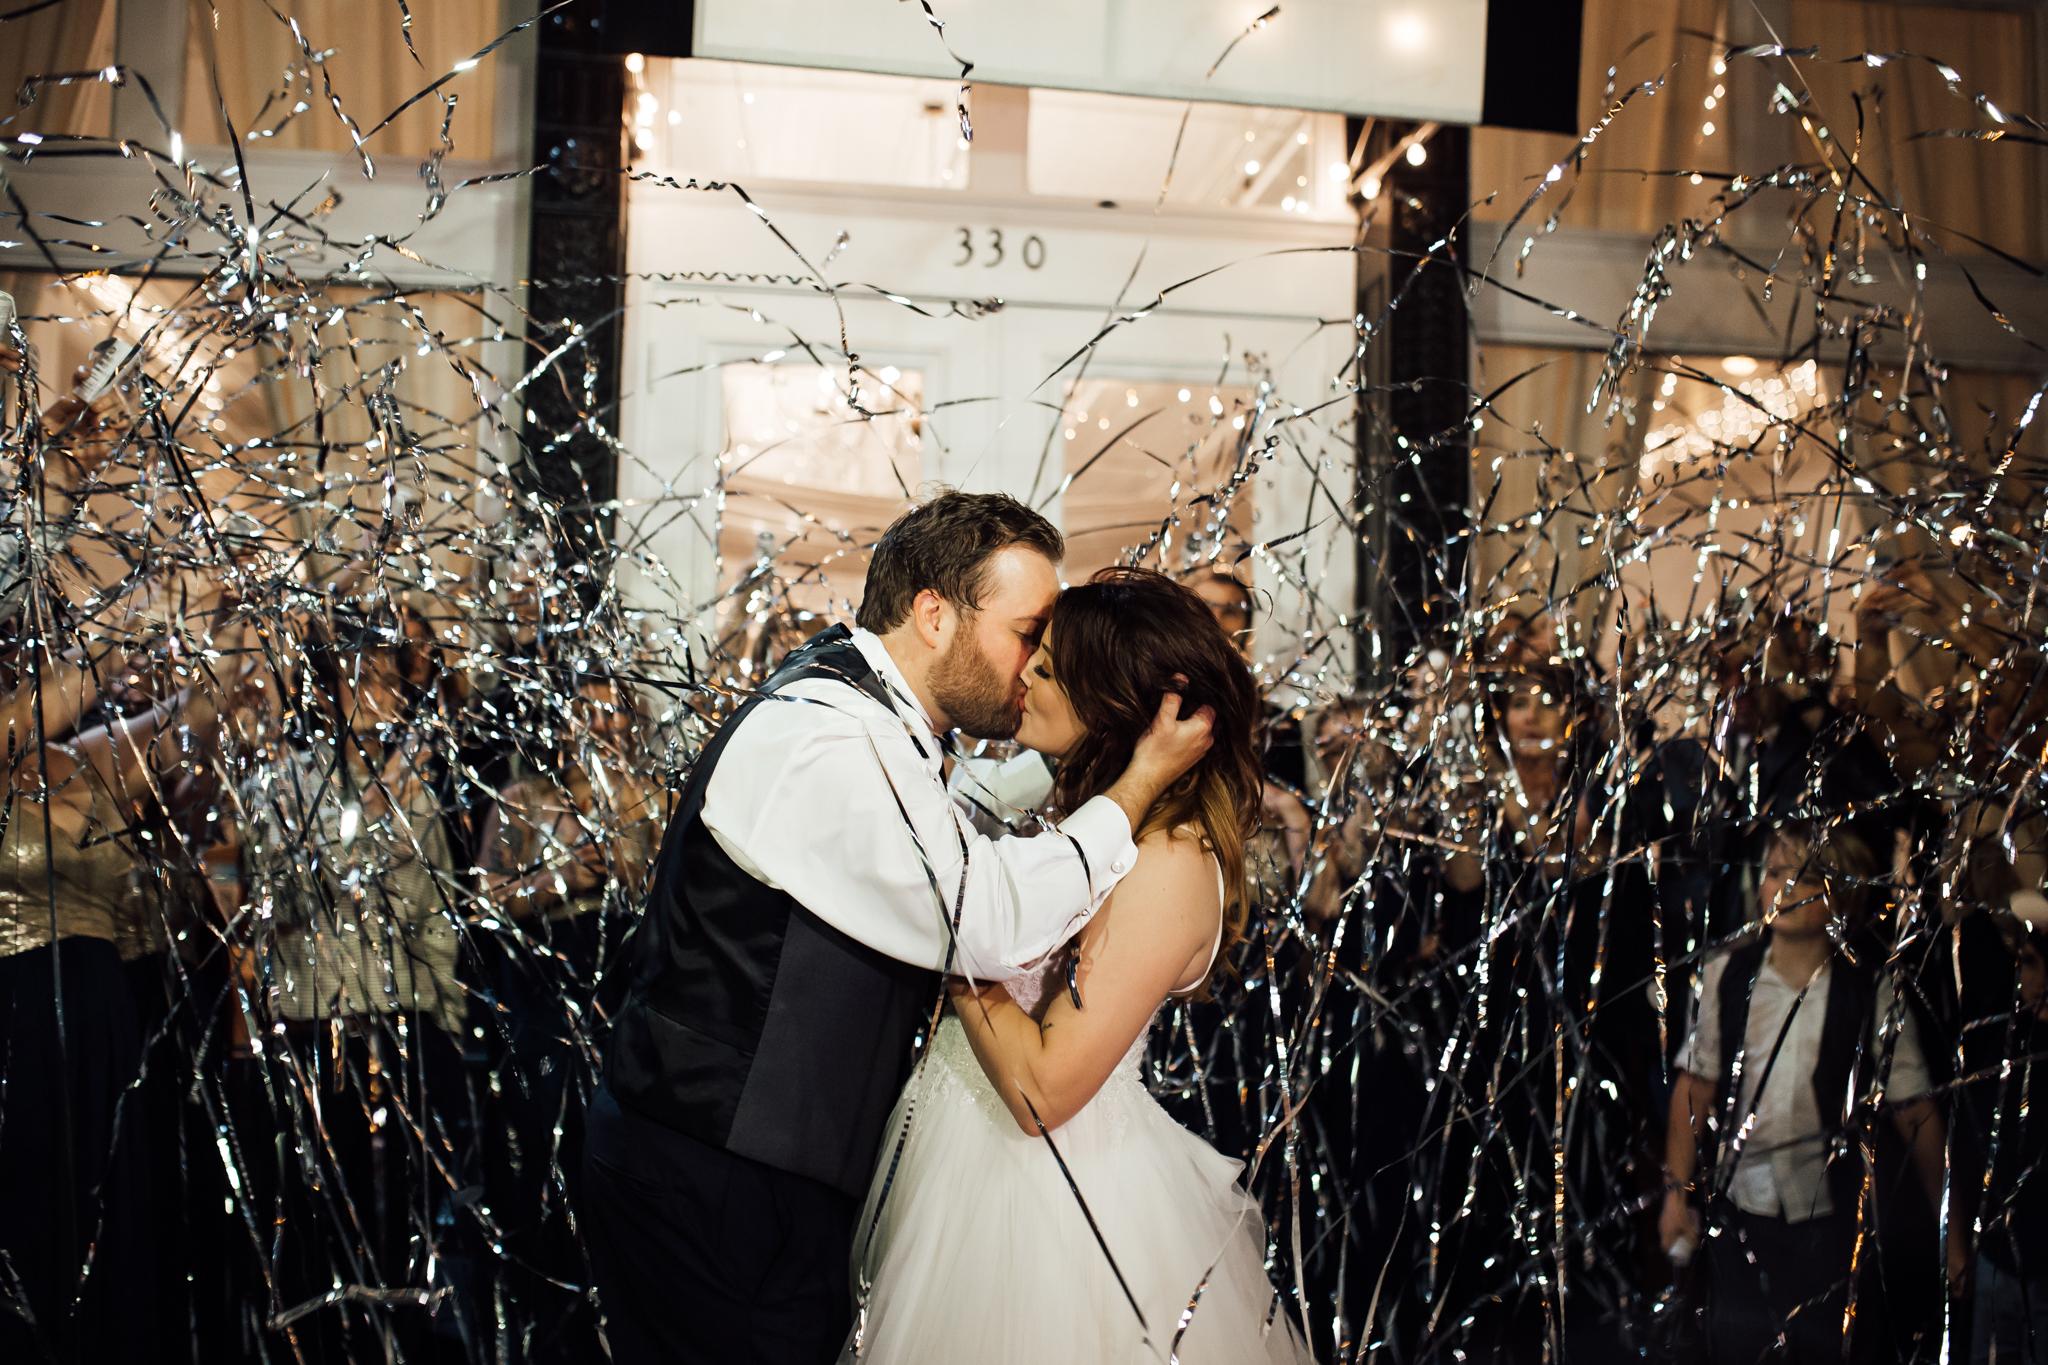 memphis-wedding-photographers-thewarmtharoundyou-ballinsese-ballroom-wedding-venue-downtown (3 of 9).jpg